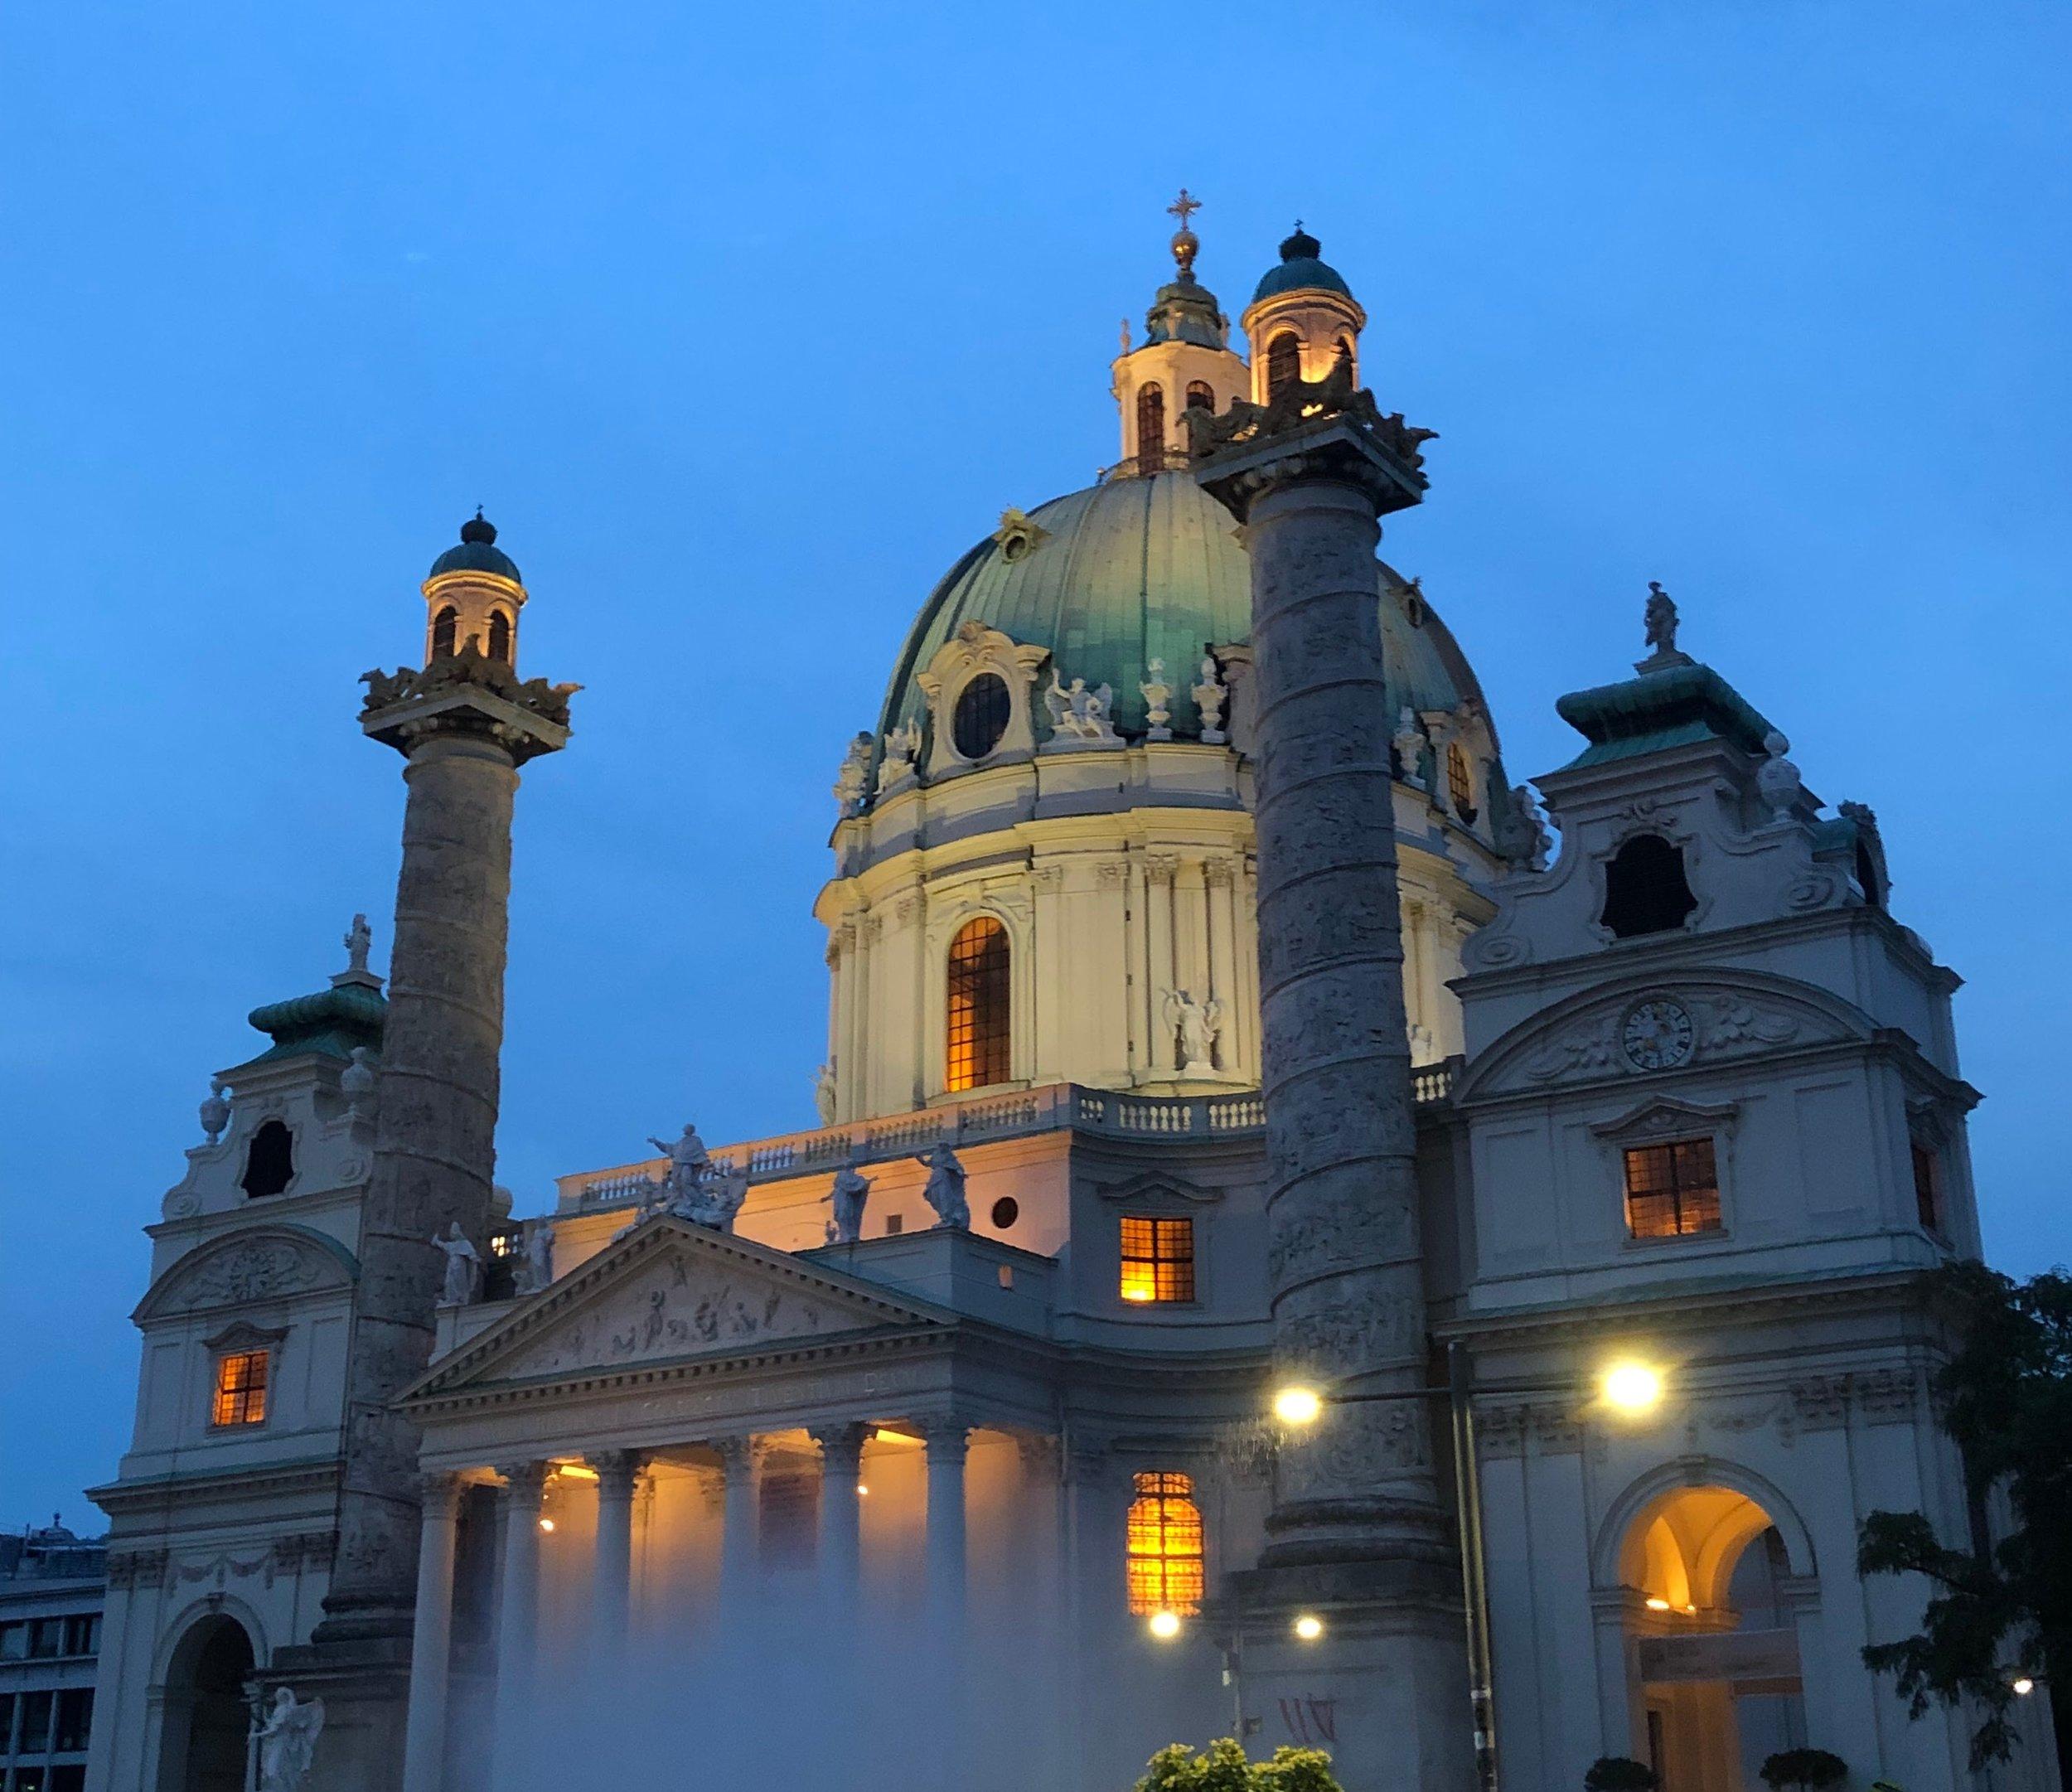 St. Charles Church, Vienna, Austria - Photo by M. Gisondi.